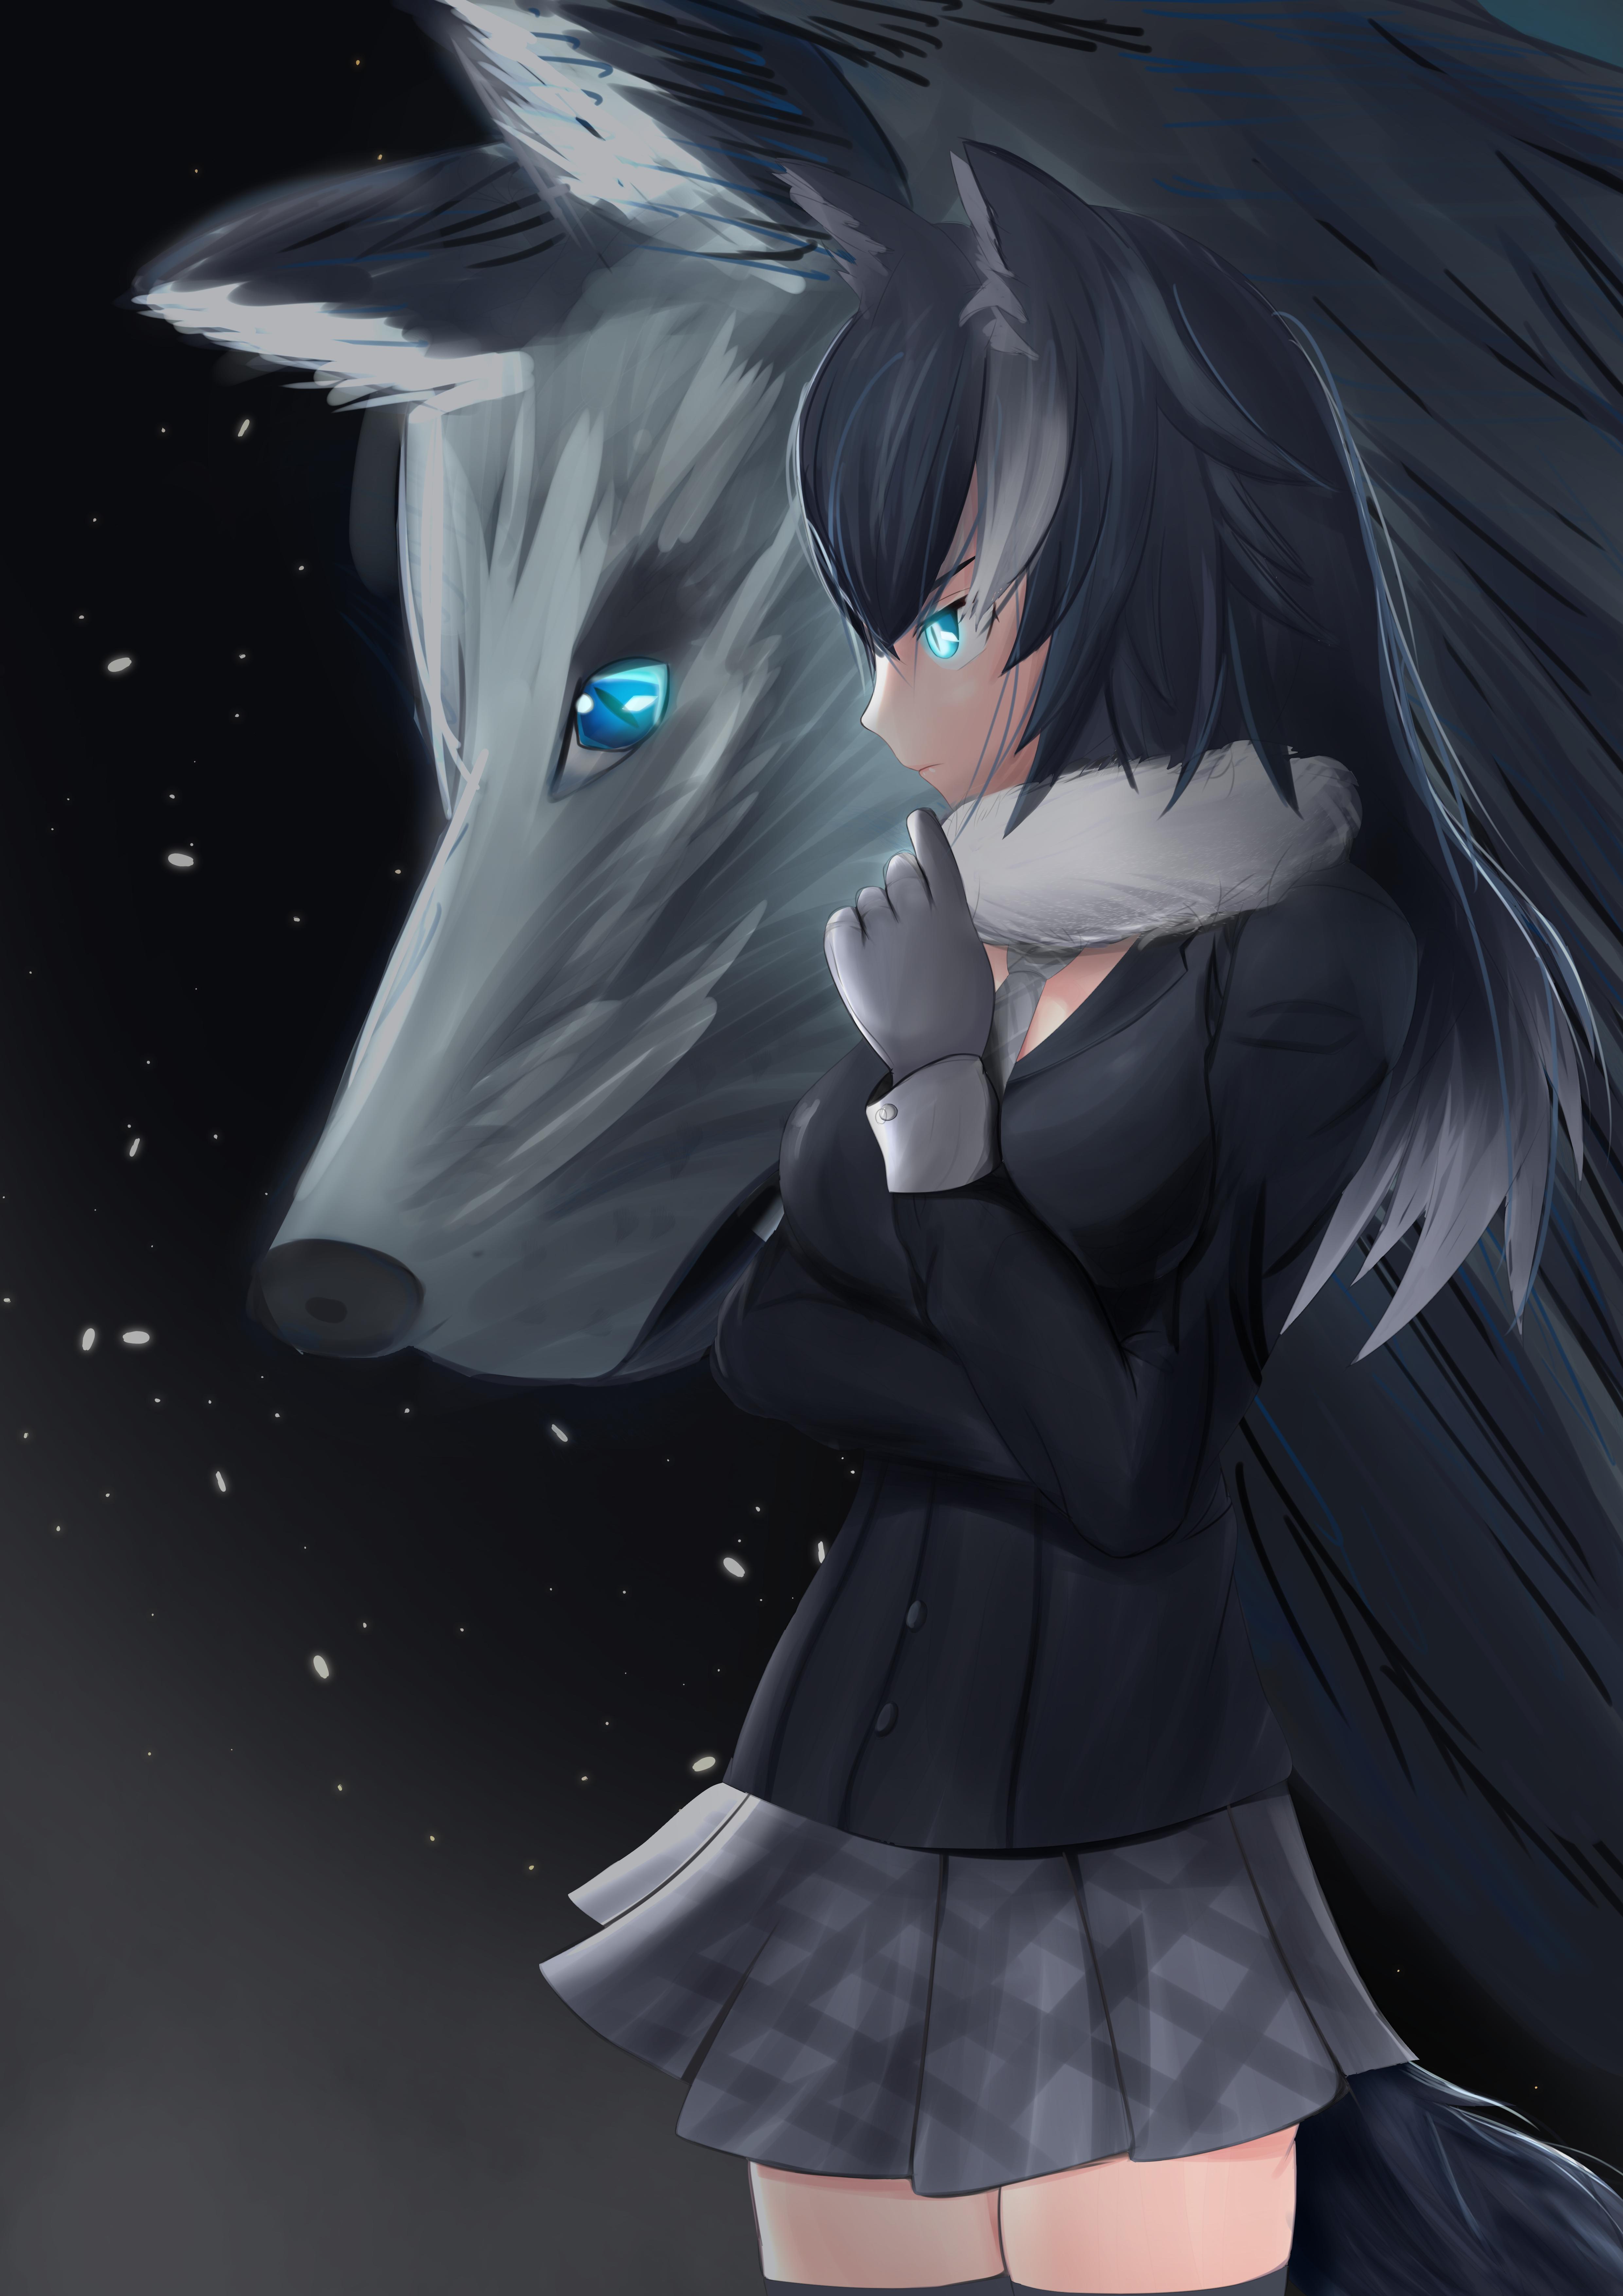 Greywolf Kemono Friend By Tor1940 On Deviantart Anime Wolf Girl Anime Furry Anime Neko